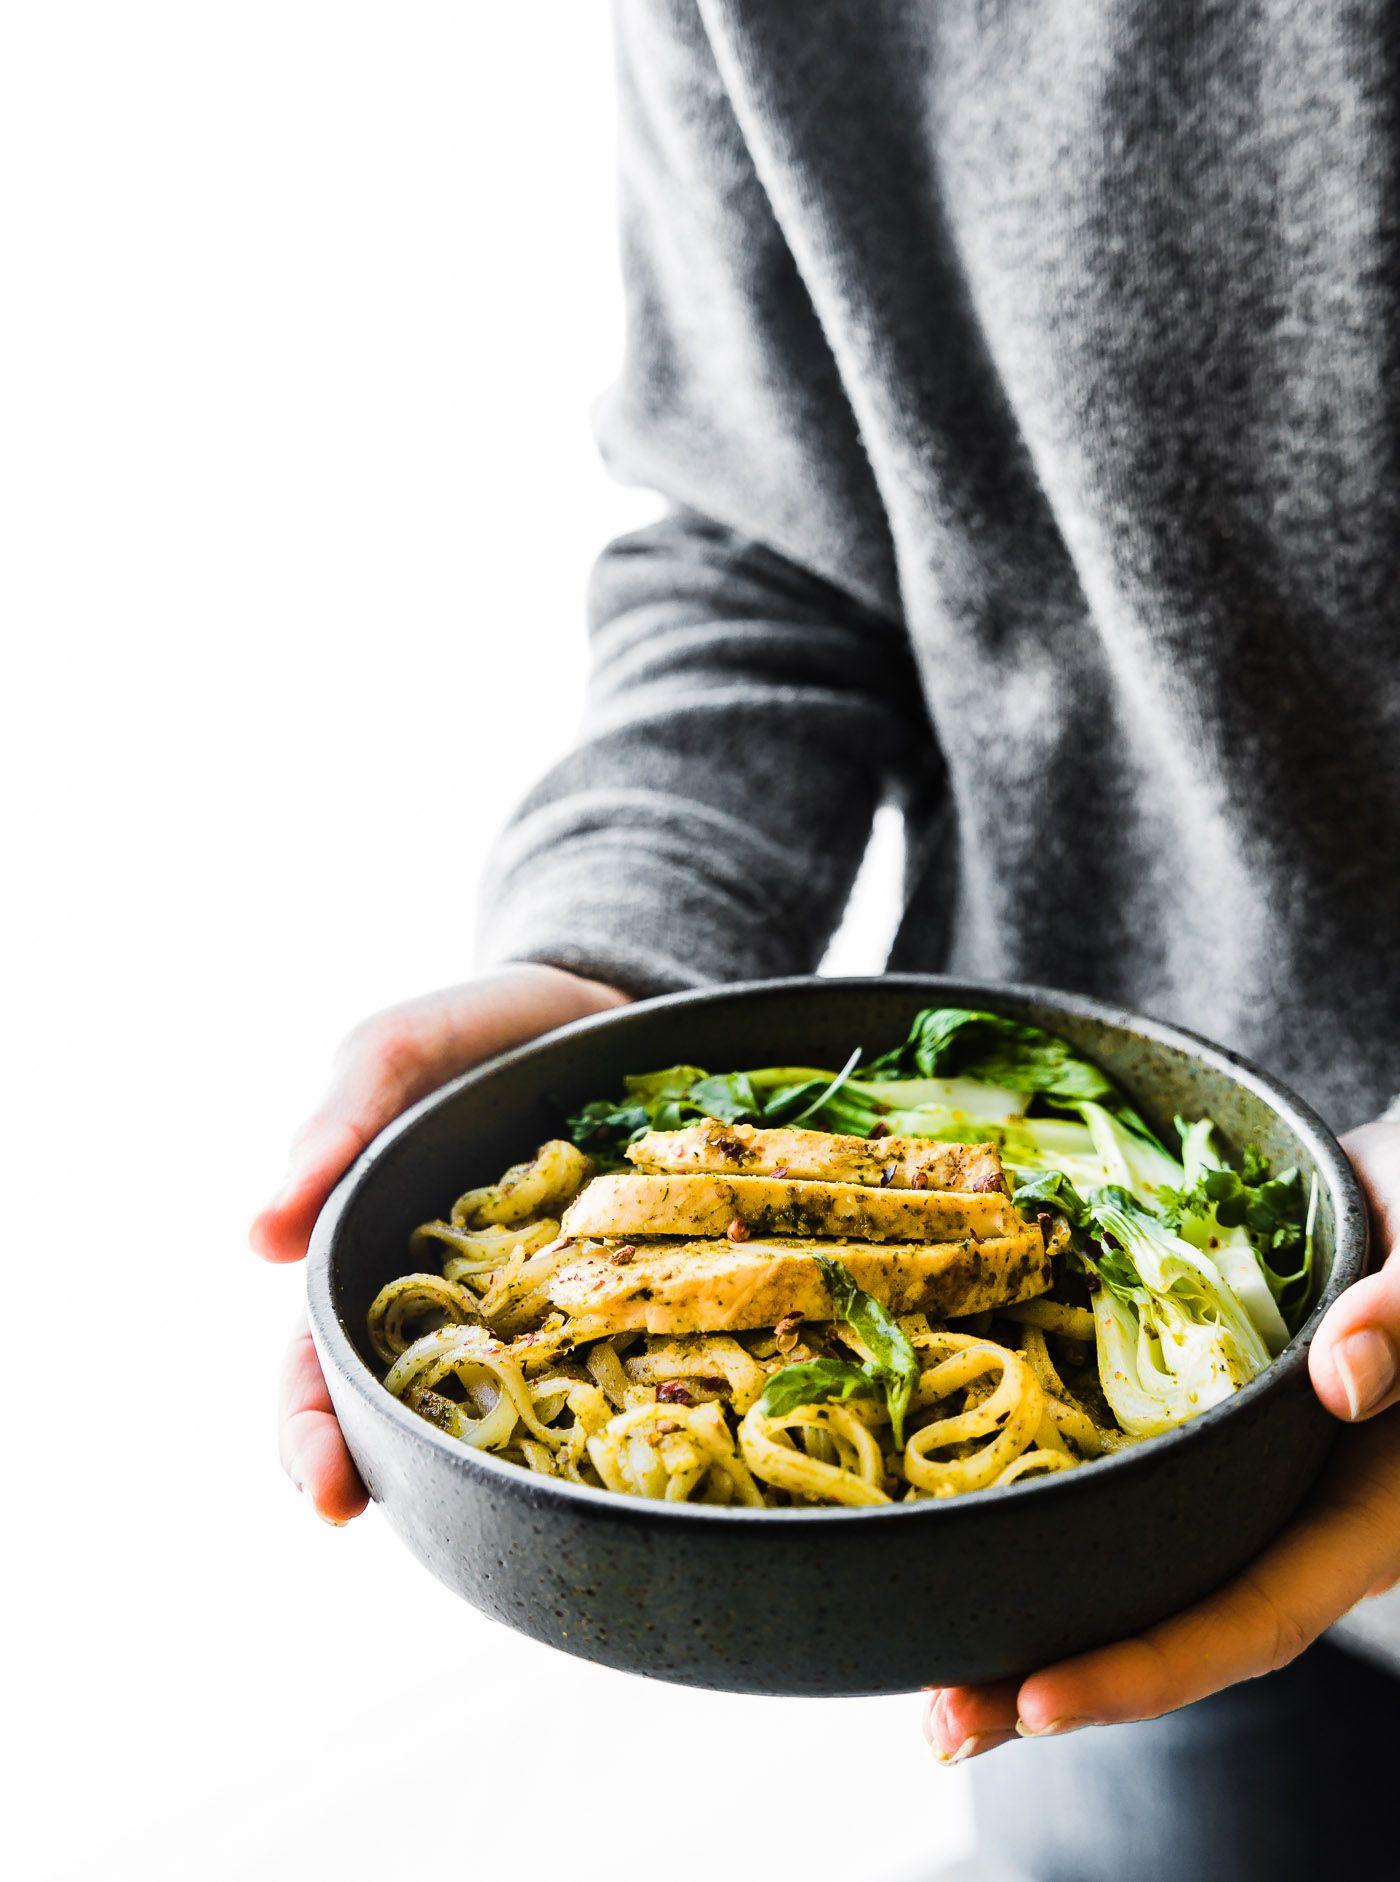 Asian Pesto Chicken Stir Fry Noodles